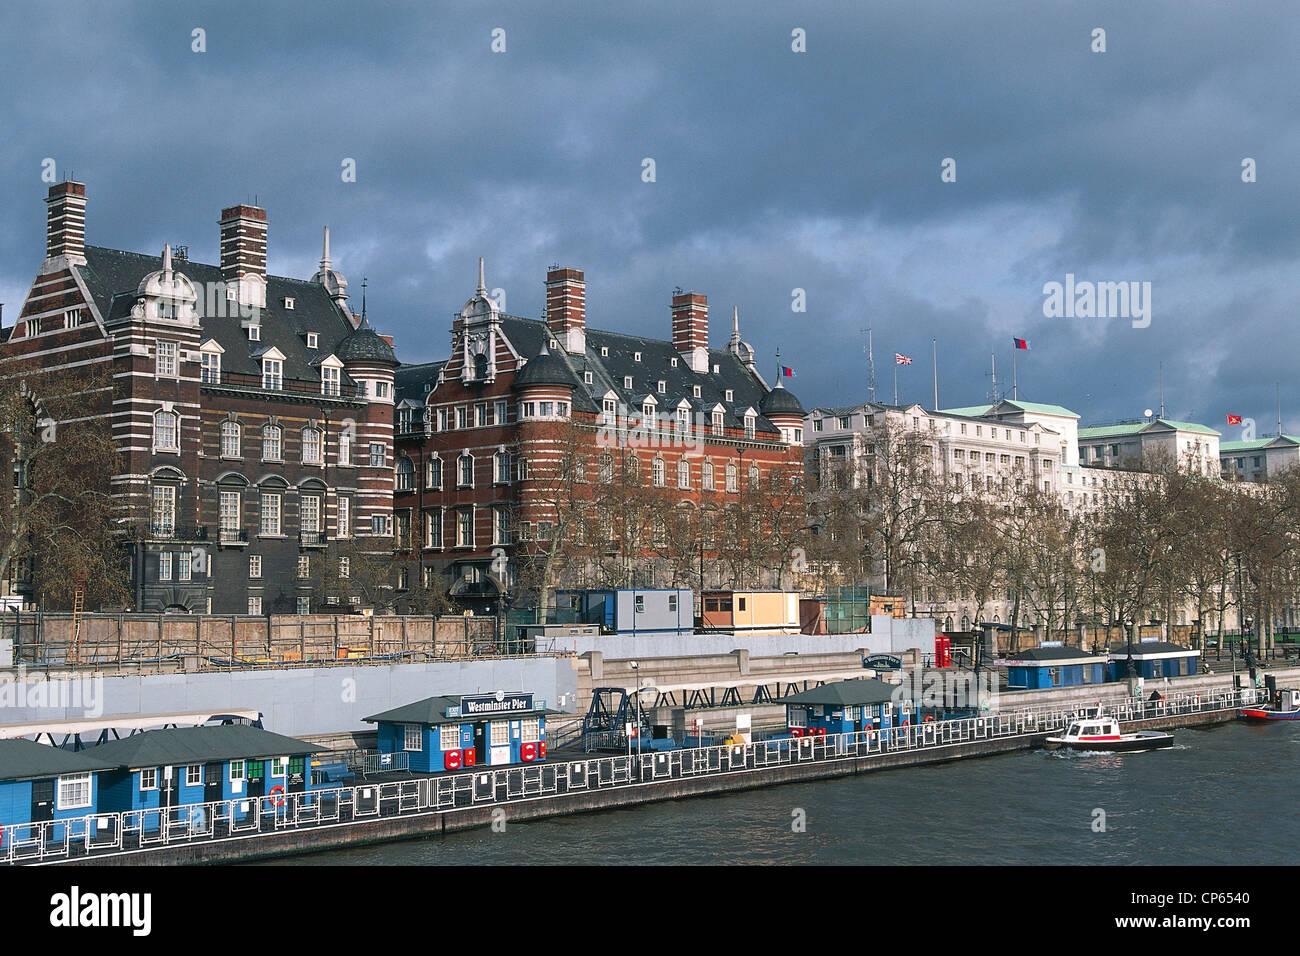 United Kingdom - England - London. Embankment on the Thames - Stock Image